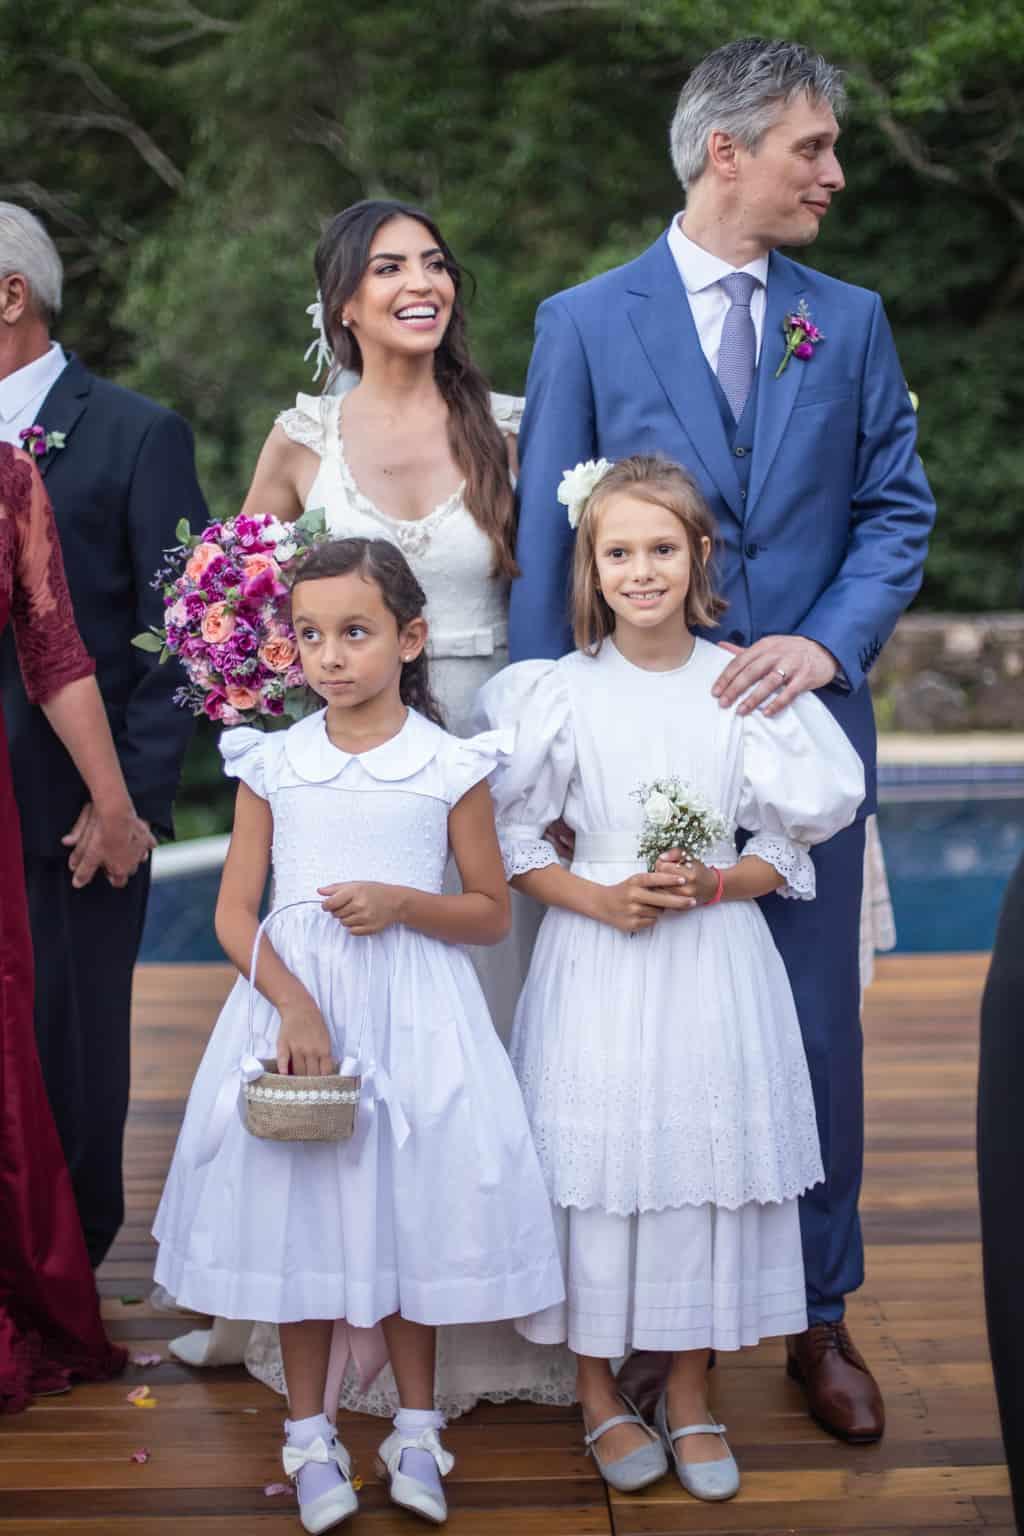 casamento-na-serra-cerimonia-ao-ar-livre-foto-da-familia-Fotografia-Laura-Campanella-graviola-filmes-Juliana-e-Sebastian-Pousada-La-Belle-Bruna286